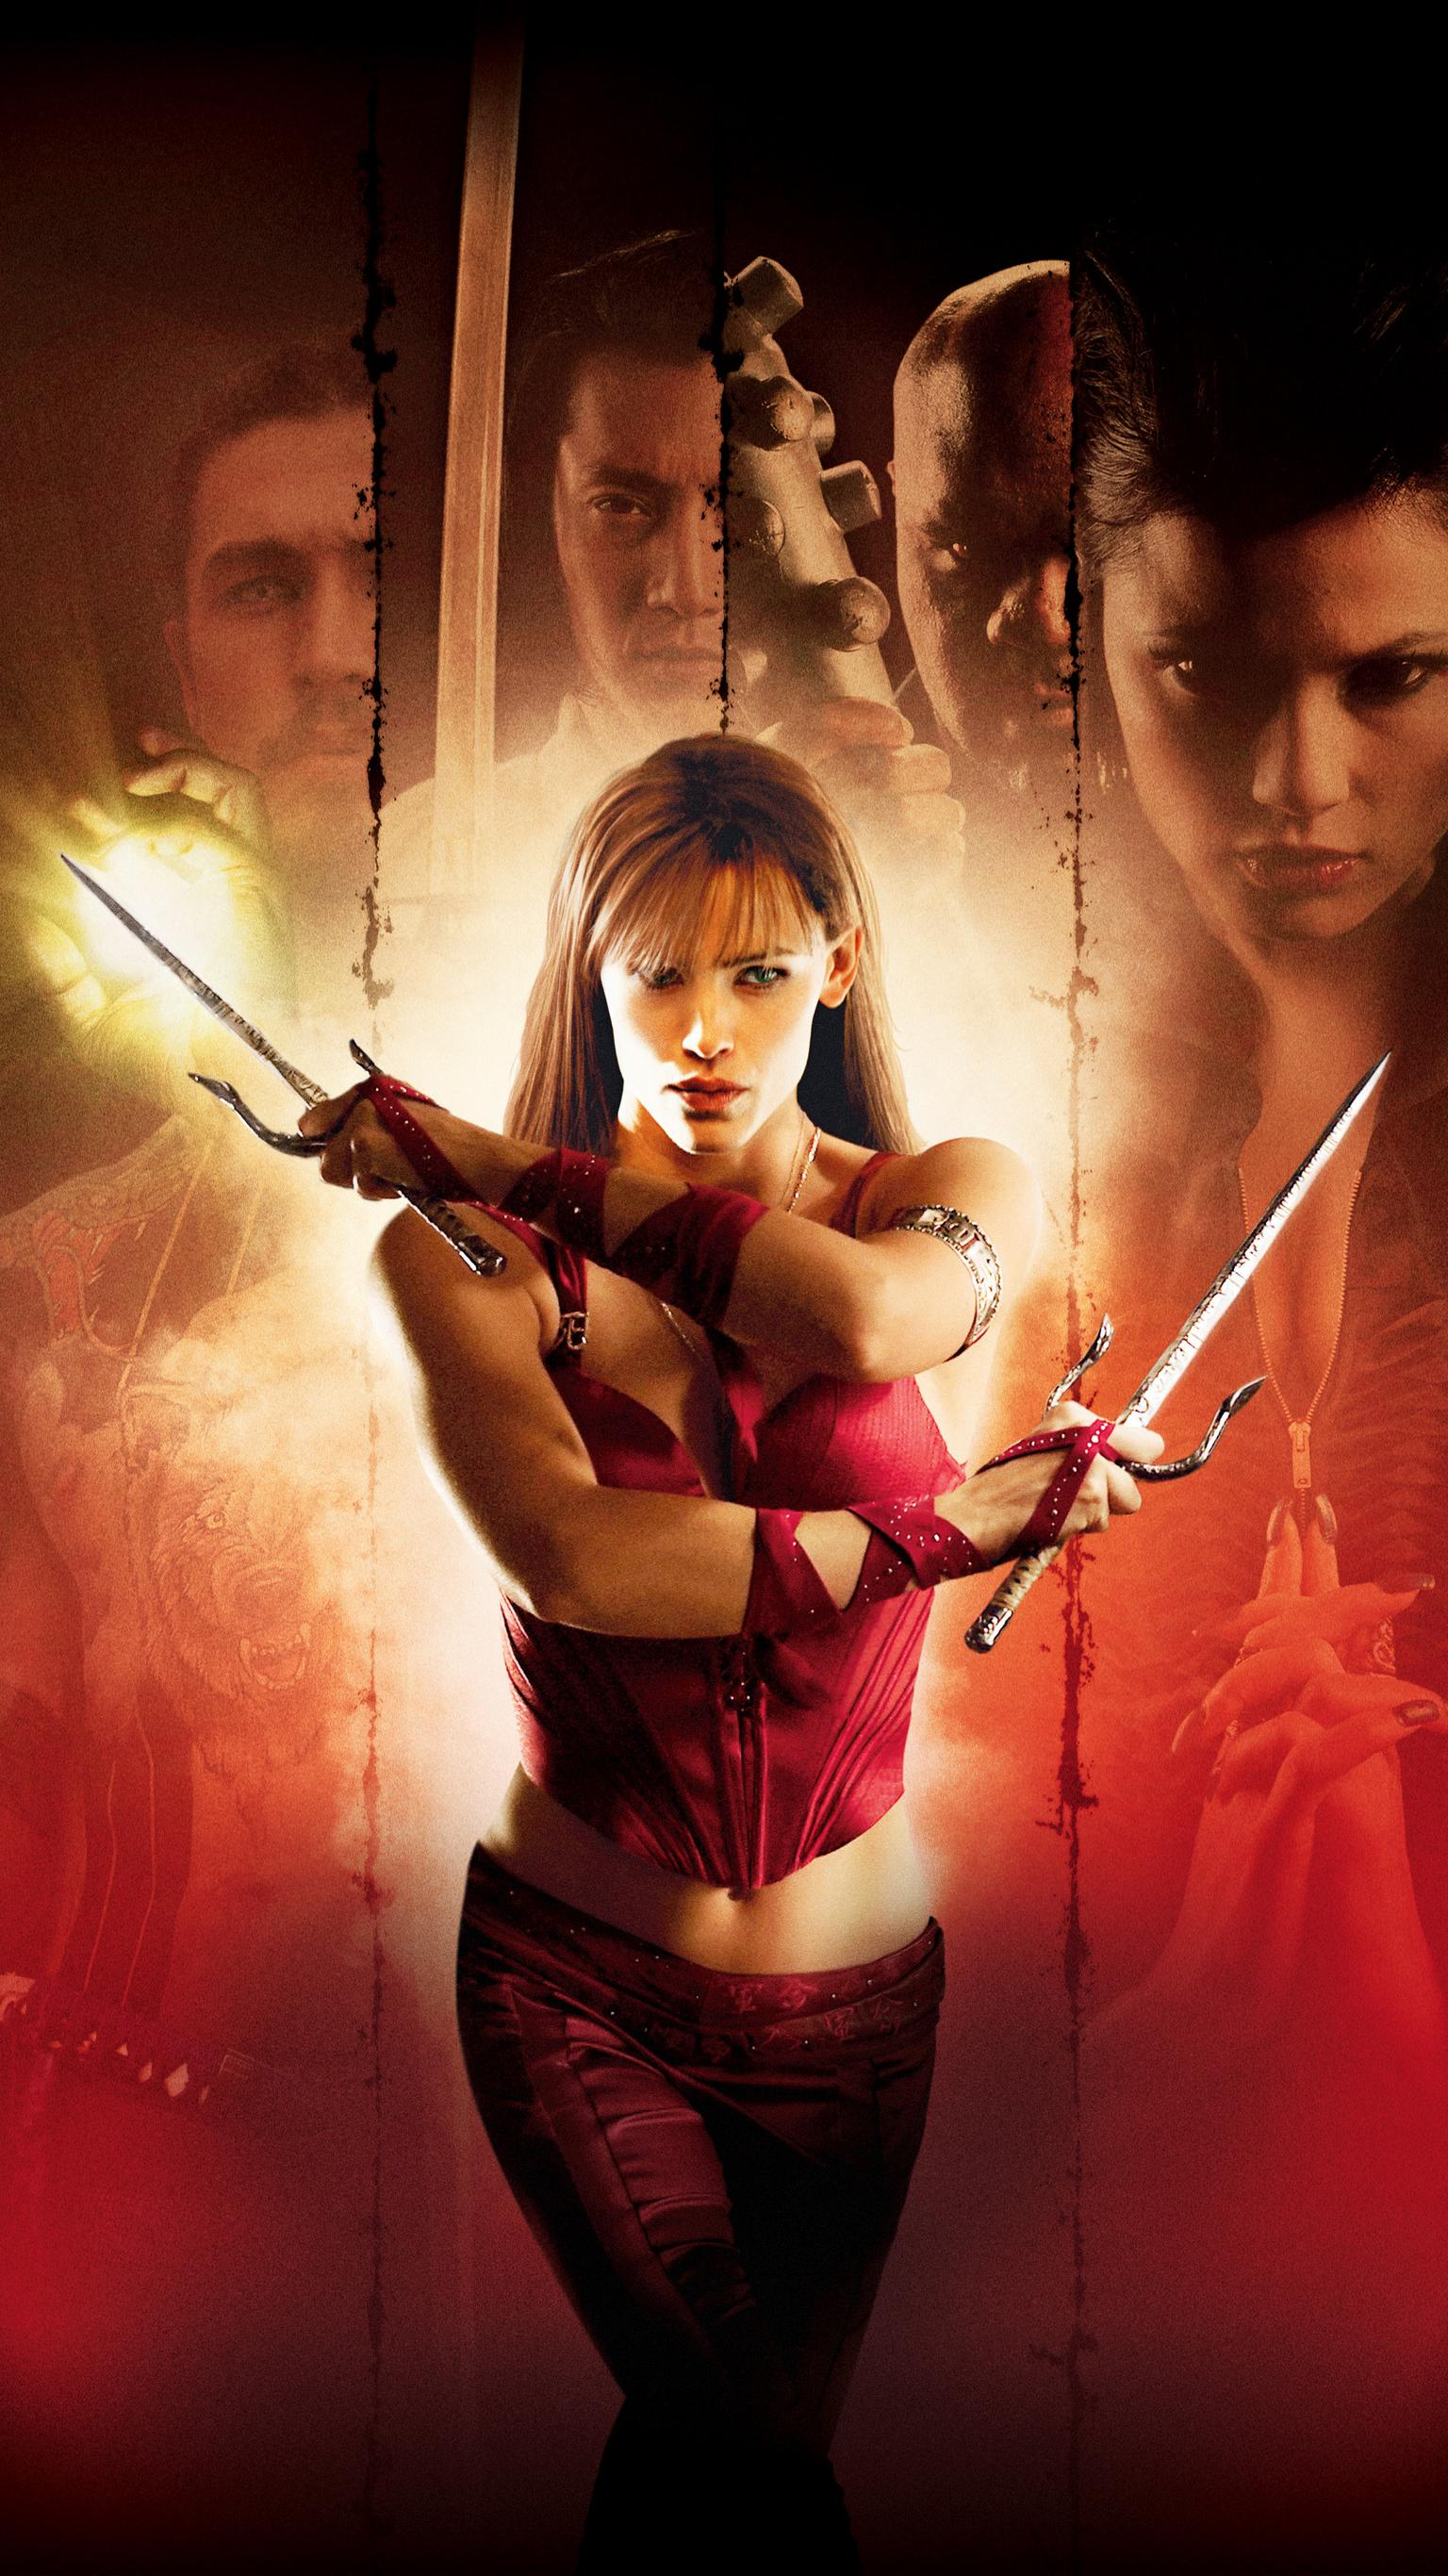 Elektra 2005 Phone Wallpaper Moviemania 1536x2732